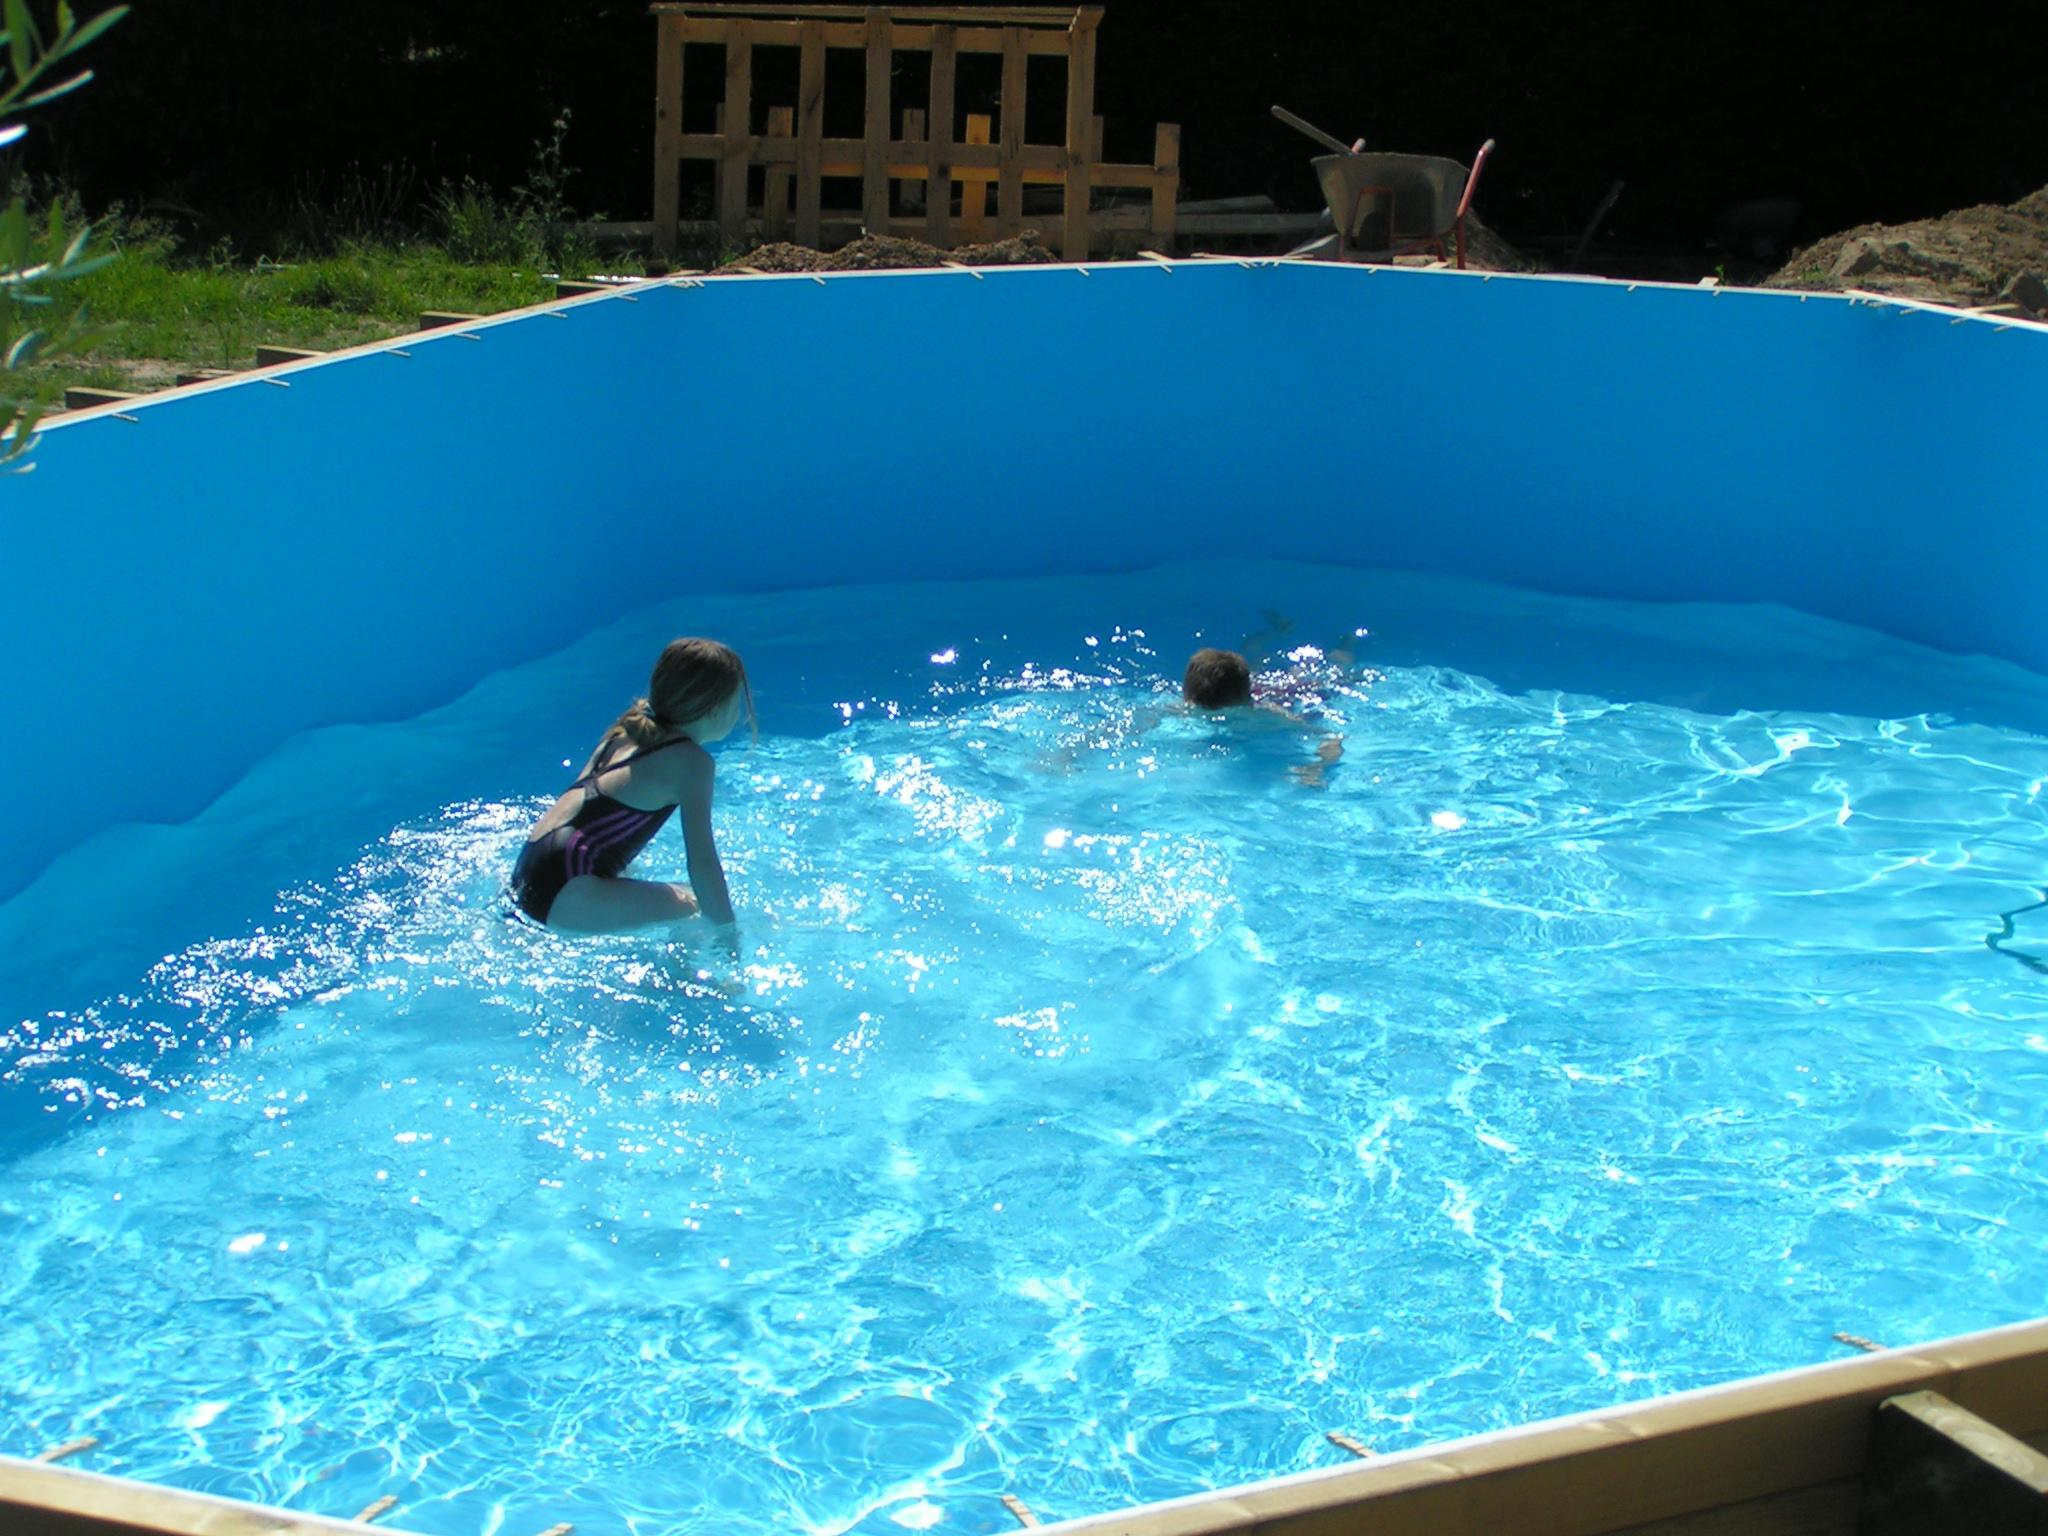 r sultats de recherche buse refoulement installation piscine bois cerland moor a solt ra 4 90. Black Bedroom Furniture Sets. Home Design Ideas